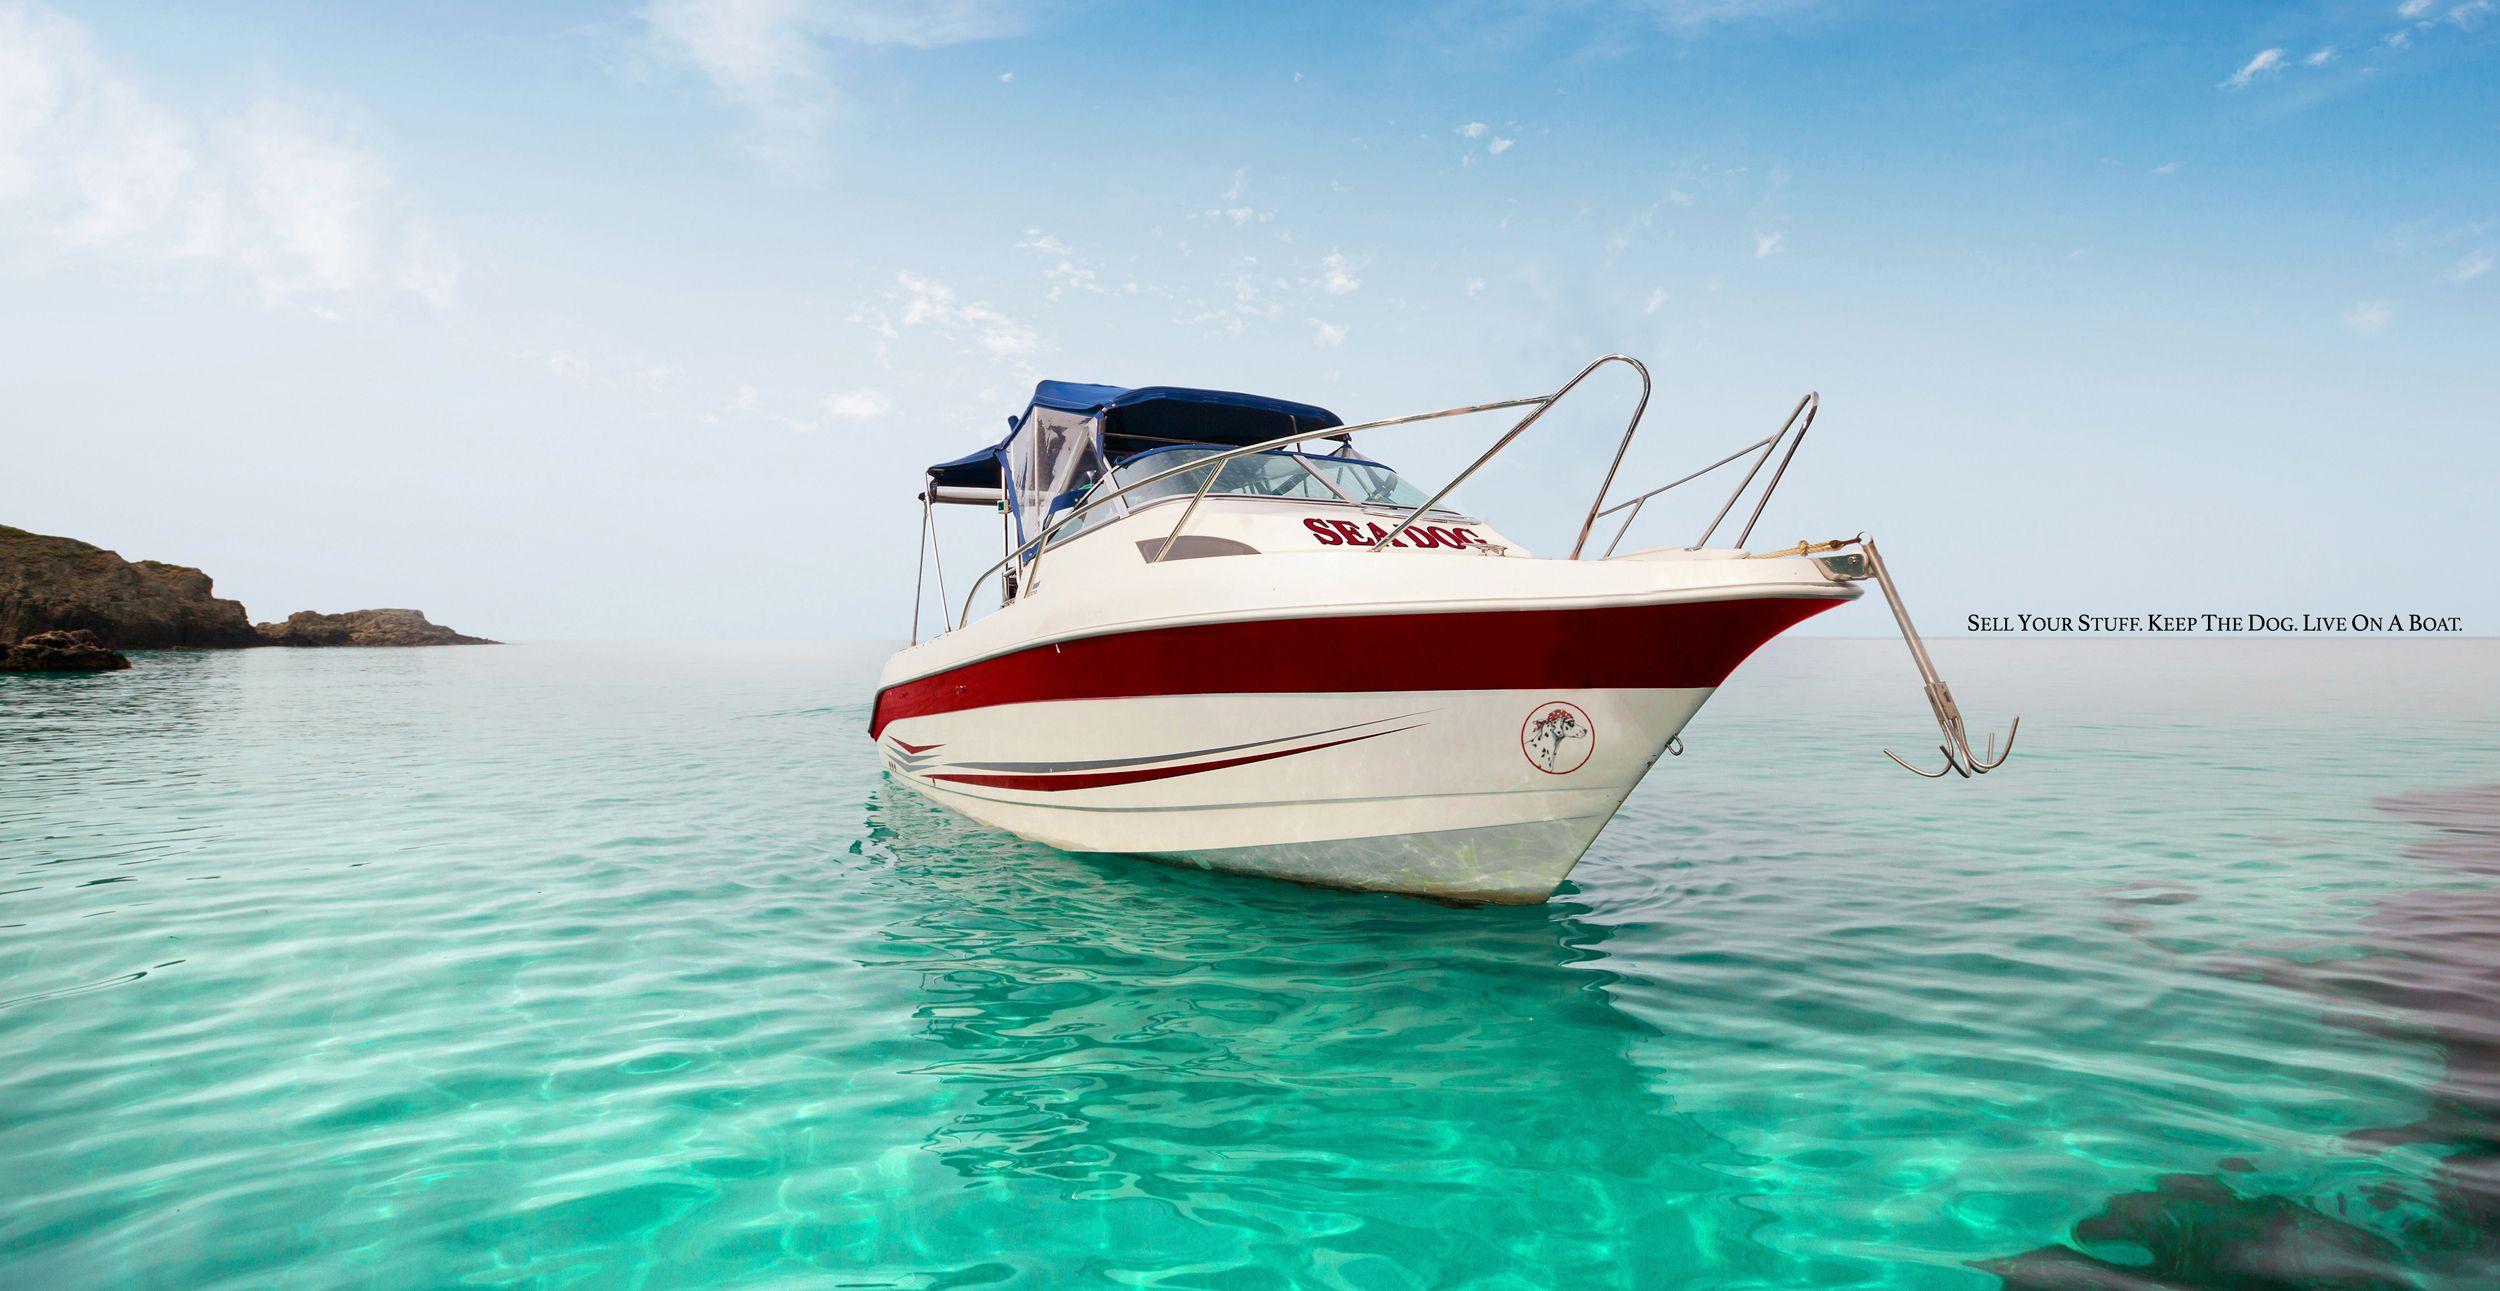 Life in a boat boat insurance